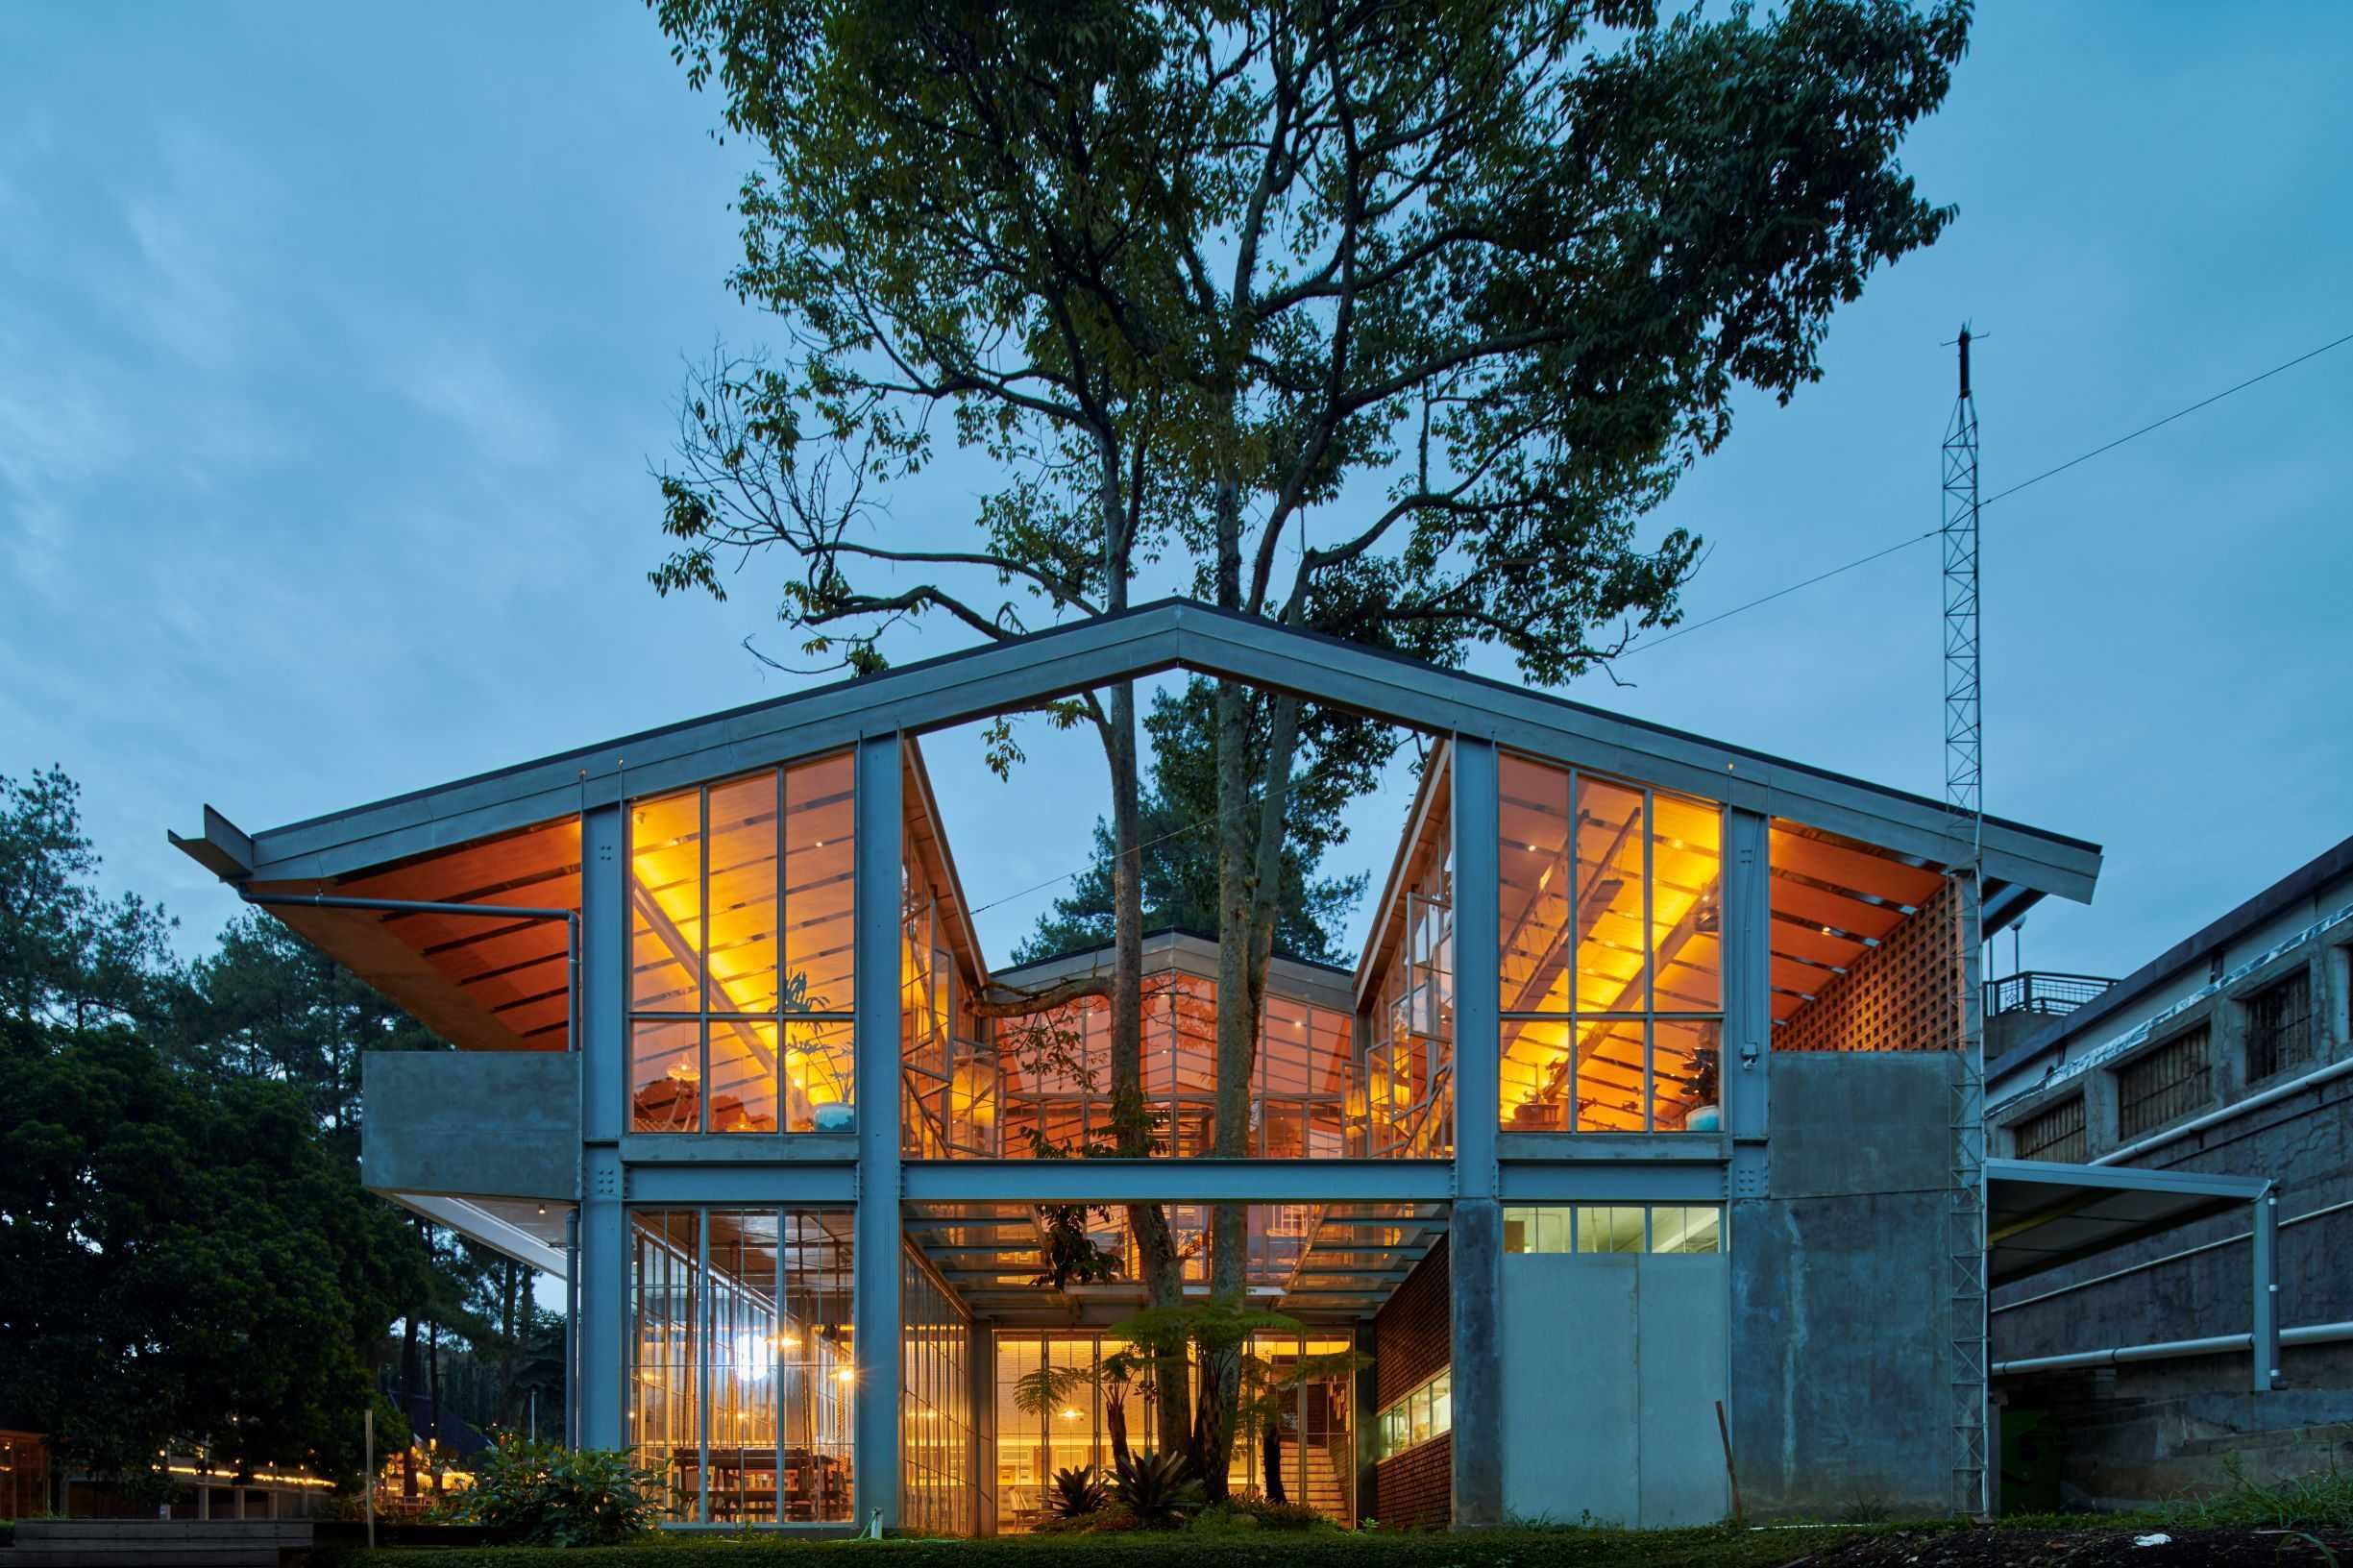 Hadivincent Architects Nara Park Ciumbuleuit, Cidadap, Kota Bandung, Jawa Barat, Indonesia Ciumbuleuit, Cidadap, Kota Bandung, Jawa Barat, Indonesia Hadivincent-Architects-Nara-Park   71546